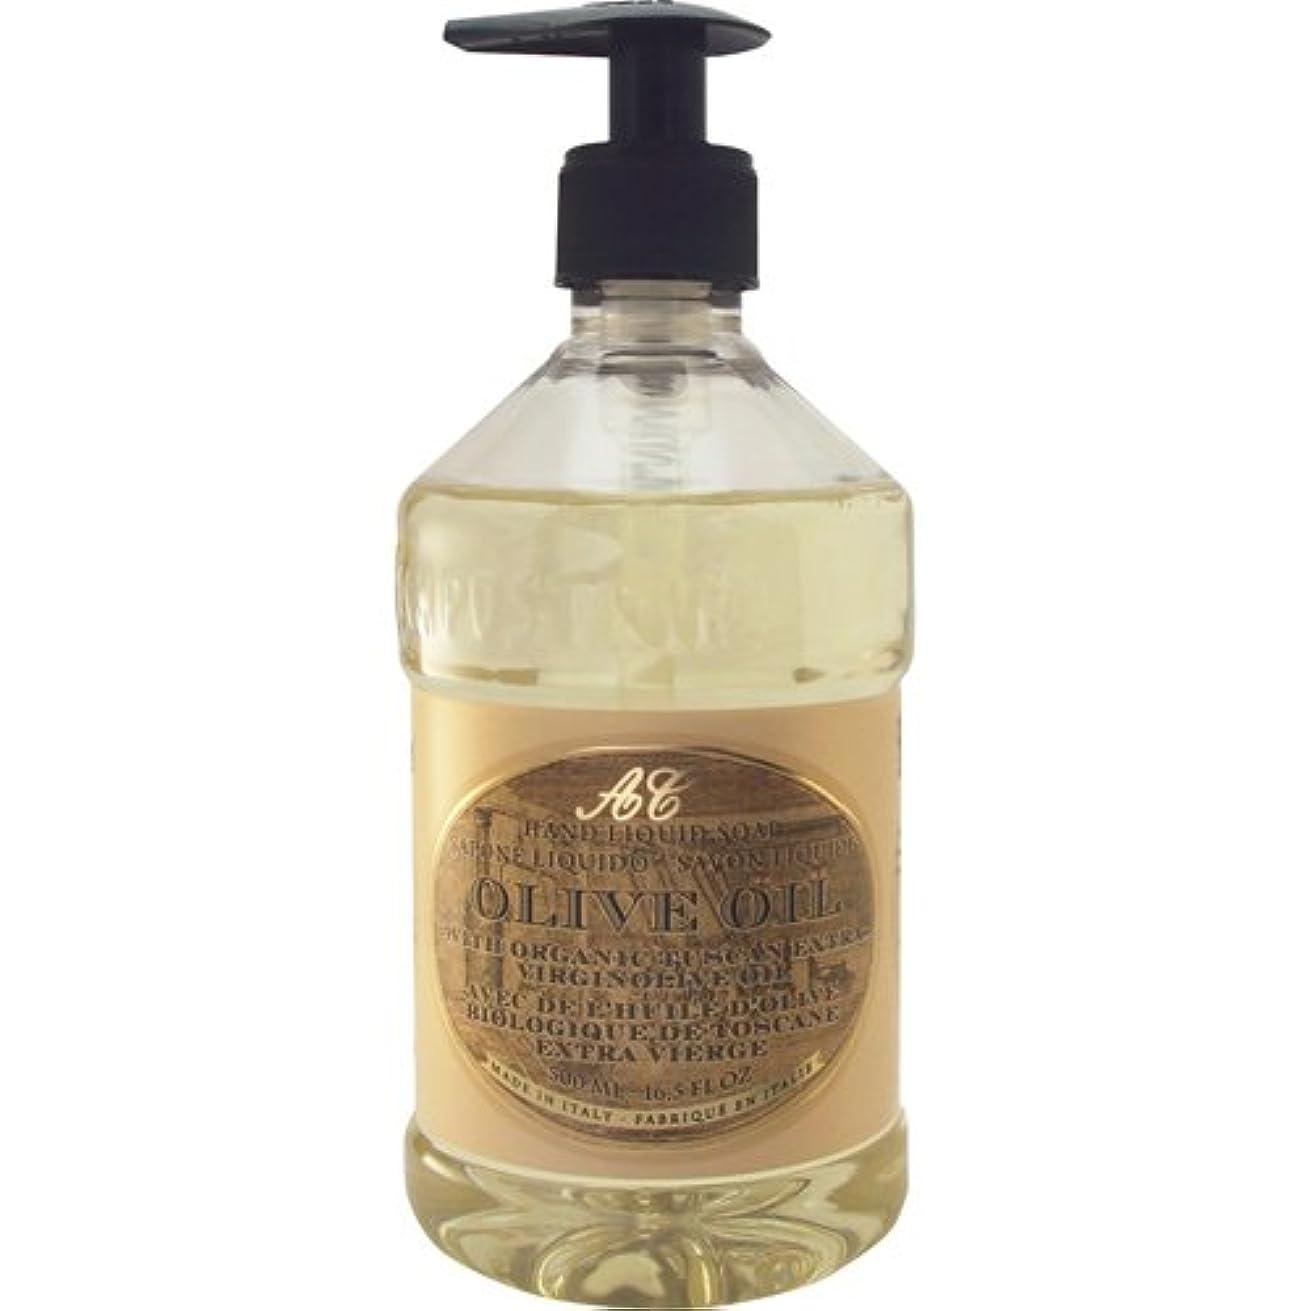 Saponerire Fissi レトロシリーズ Liquid Soap リキッドソープ 500ml Olive Oil オリーブオイル